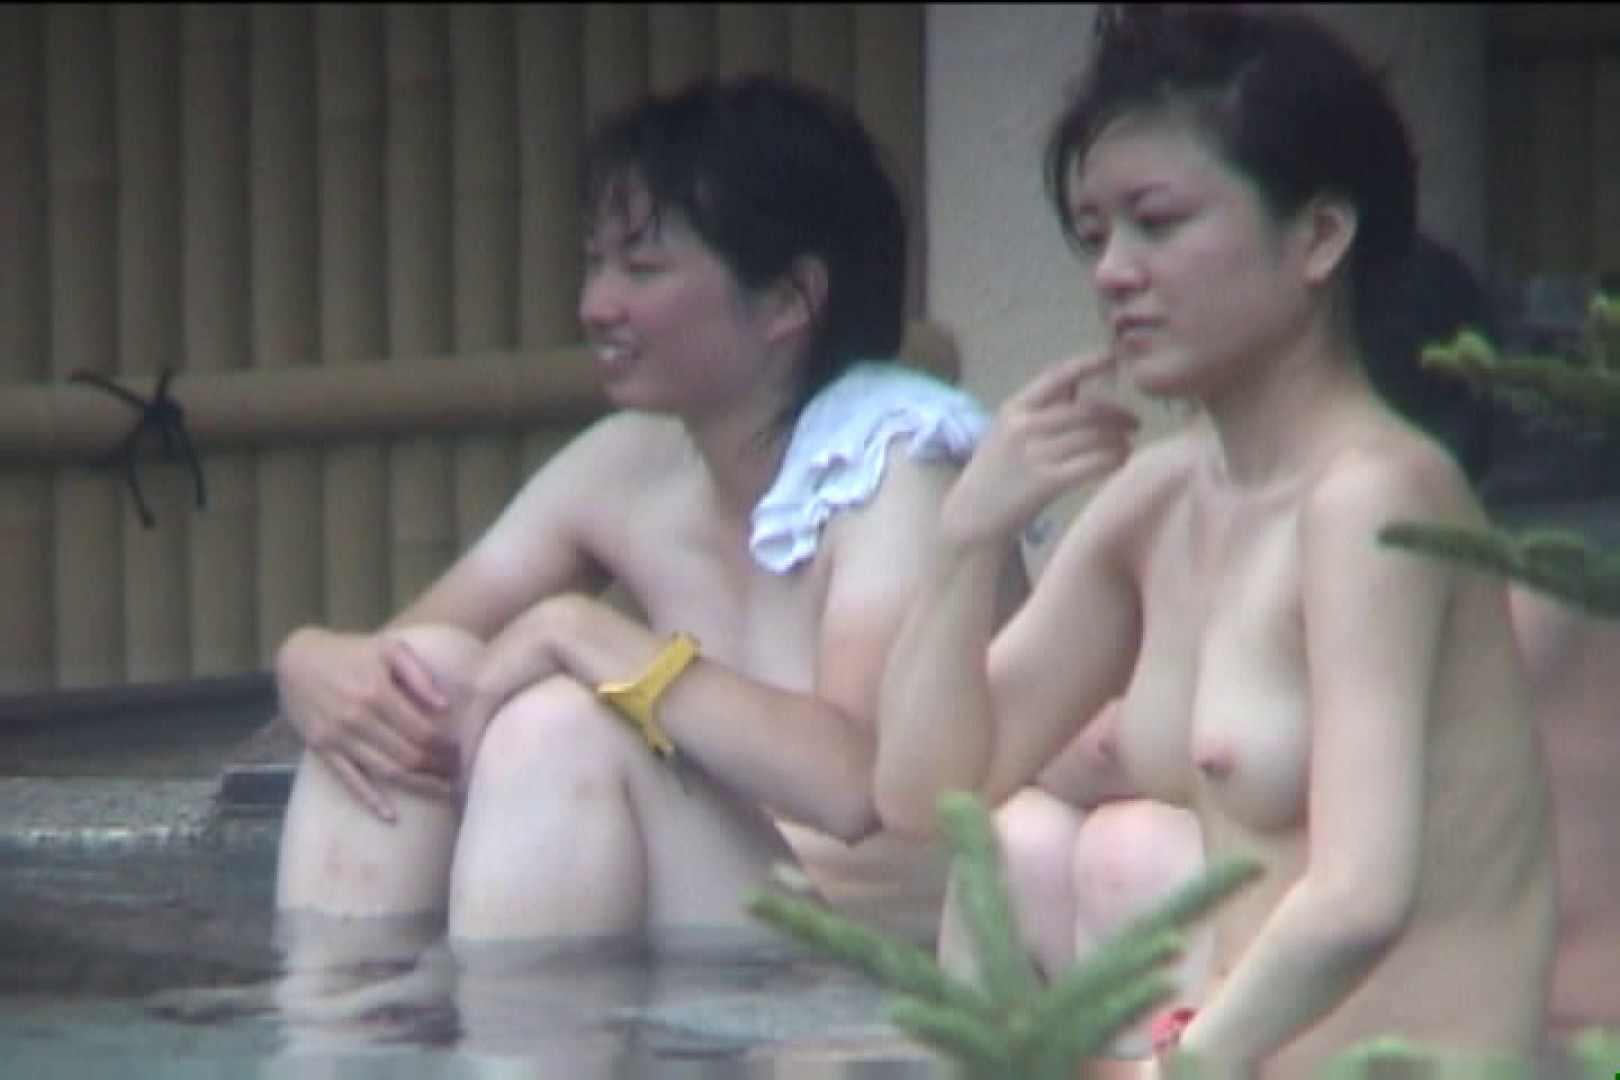 Aquaな露天風呂Vol.94【VIP限定】 盗撮シリーズ | 露天風呂編  111PIX 33